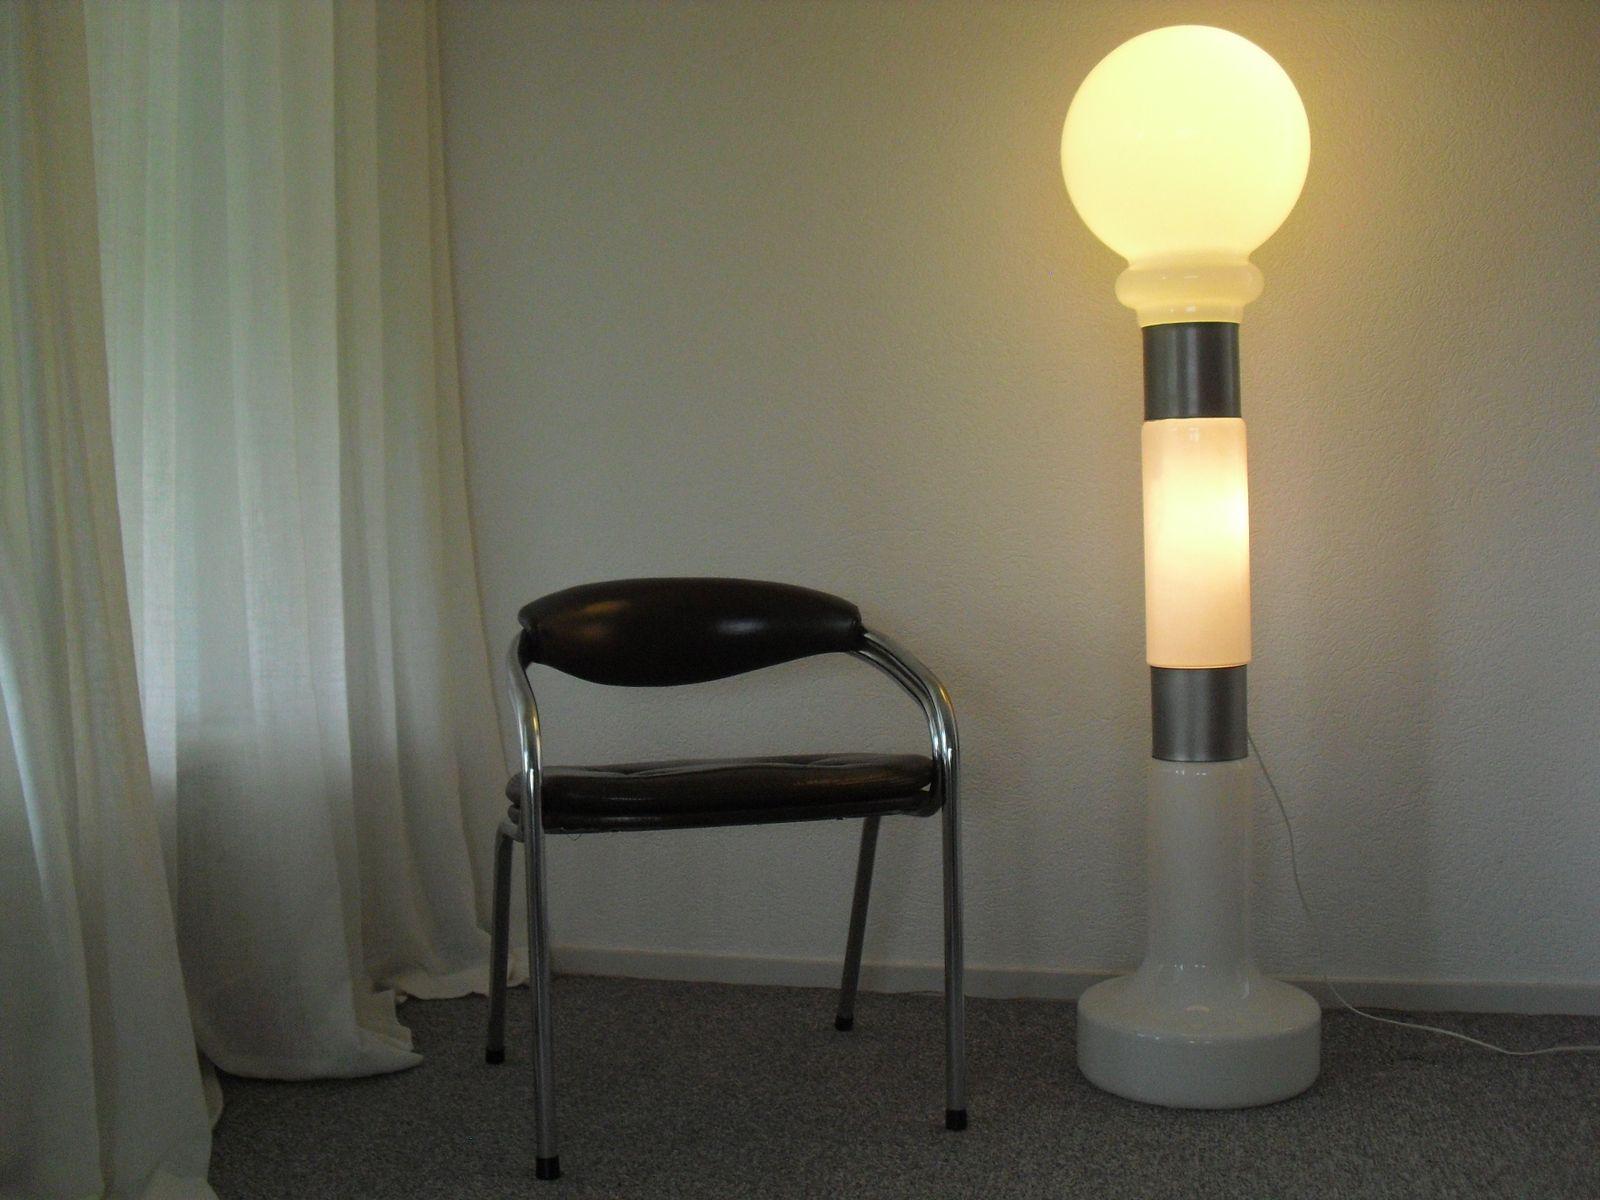 lampadaire en verre de murano par carlo nason pour mazzega italie 1960s en vente sur pamono. Black Bedroom Furniture Sets. Home Design Ideas